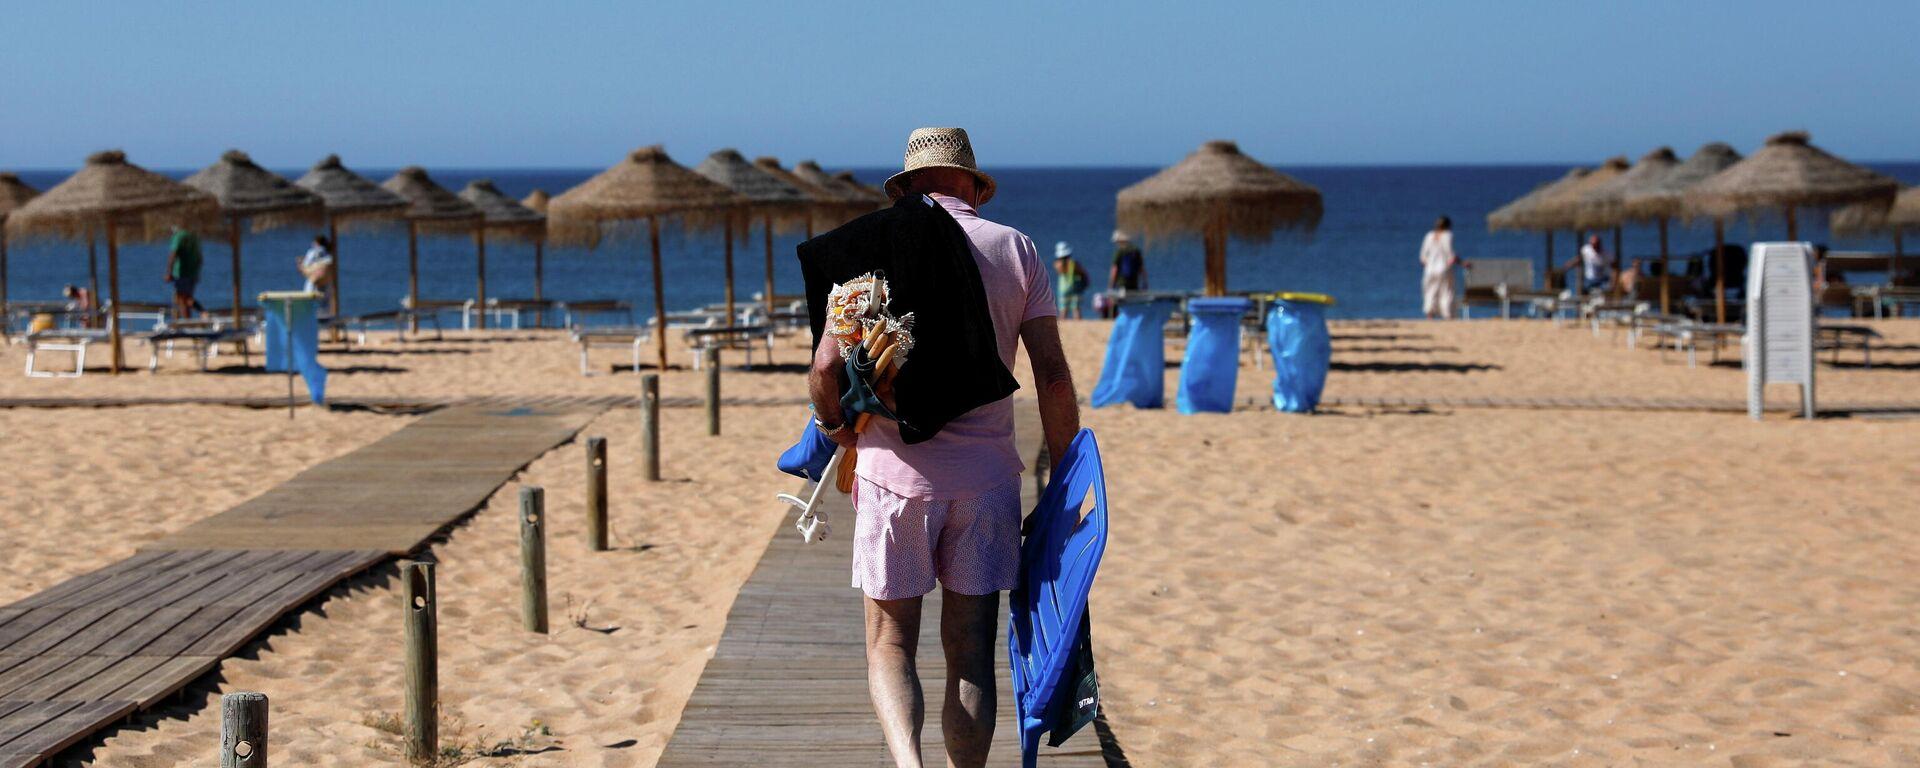 Mann am Strand in Portugal  - SNA, 1920, 12.07.2021